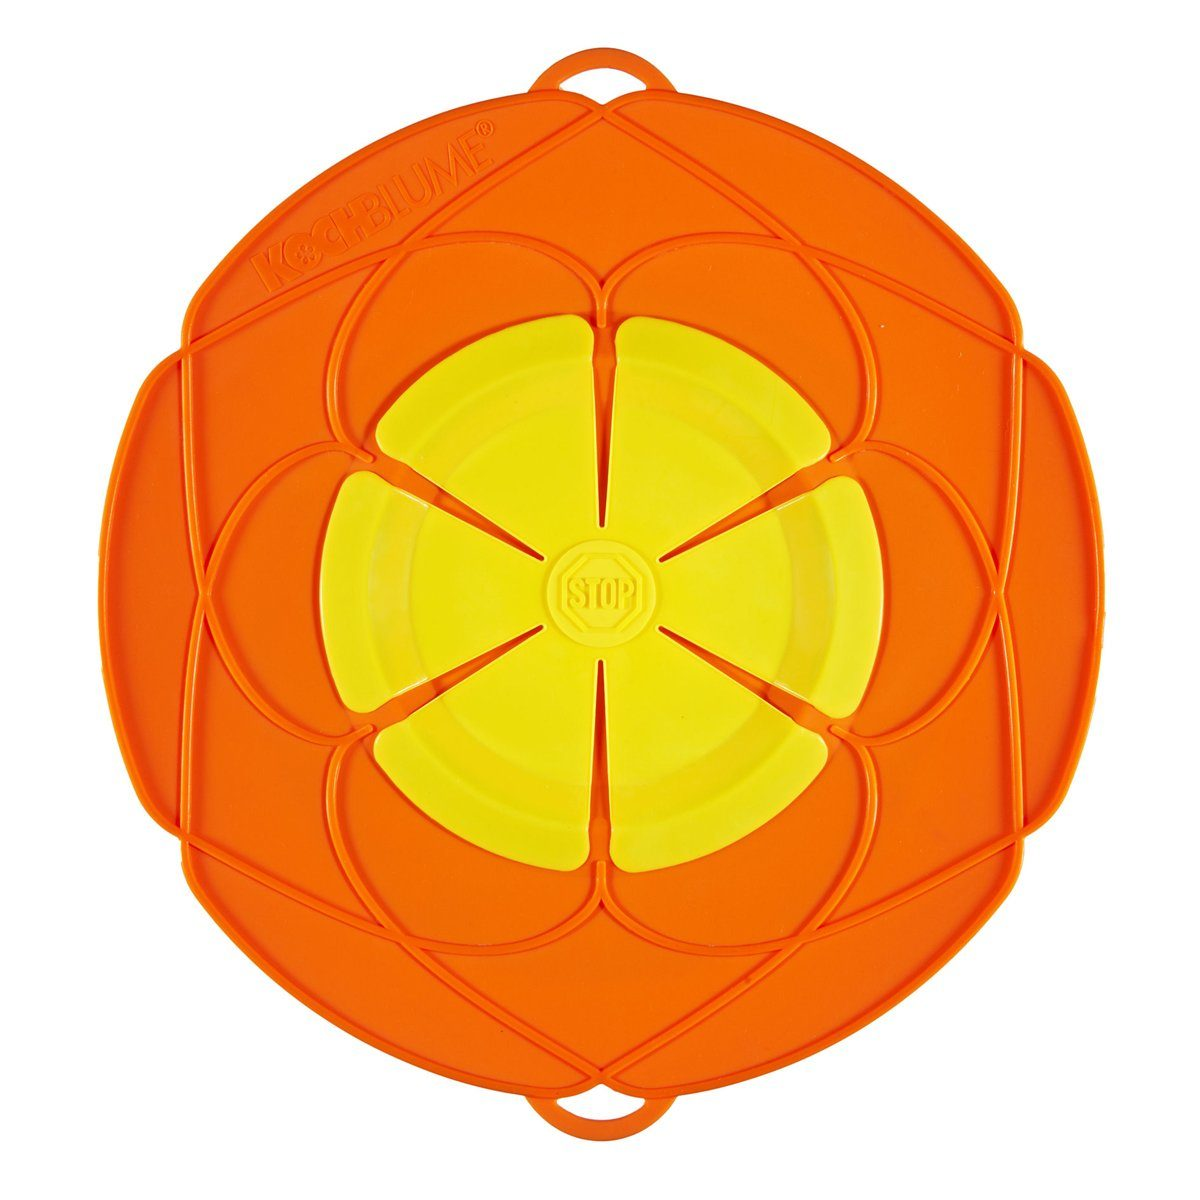 Kochblume Kochblume Überkochschutz orange 29 cm